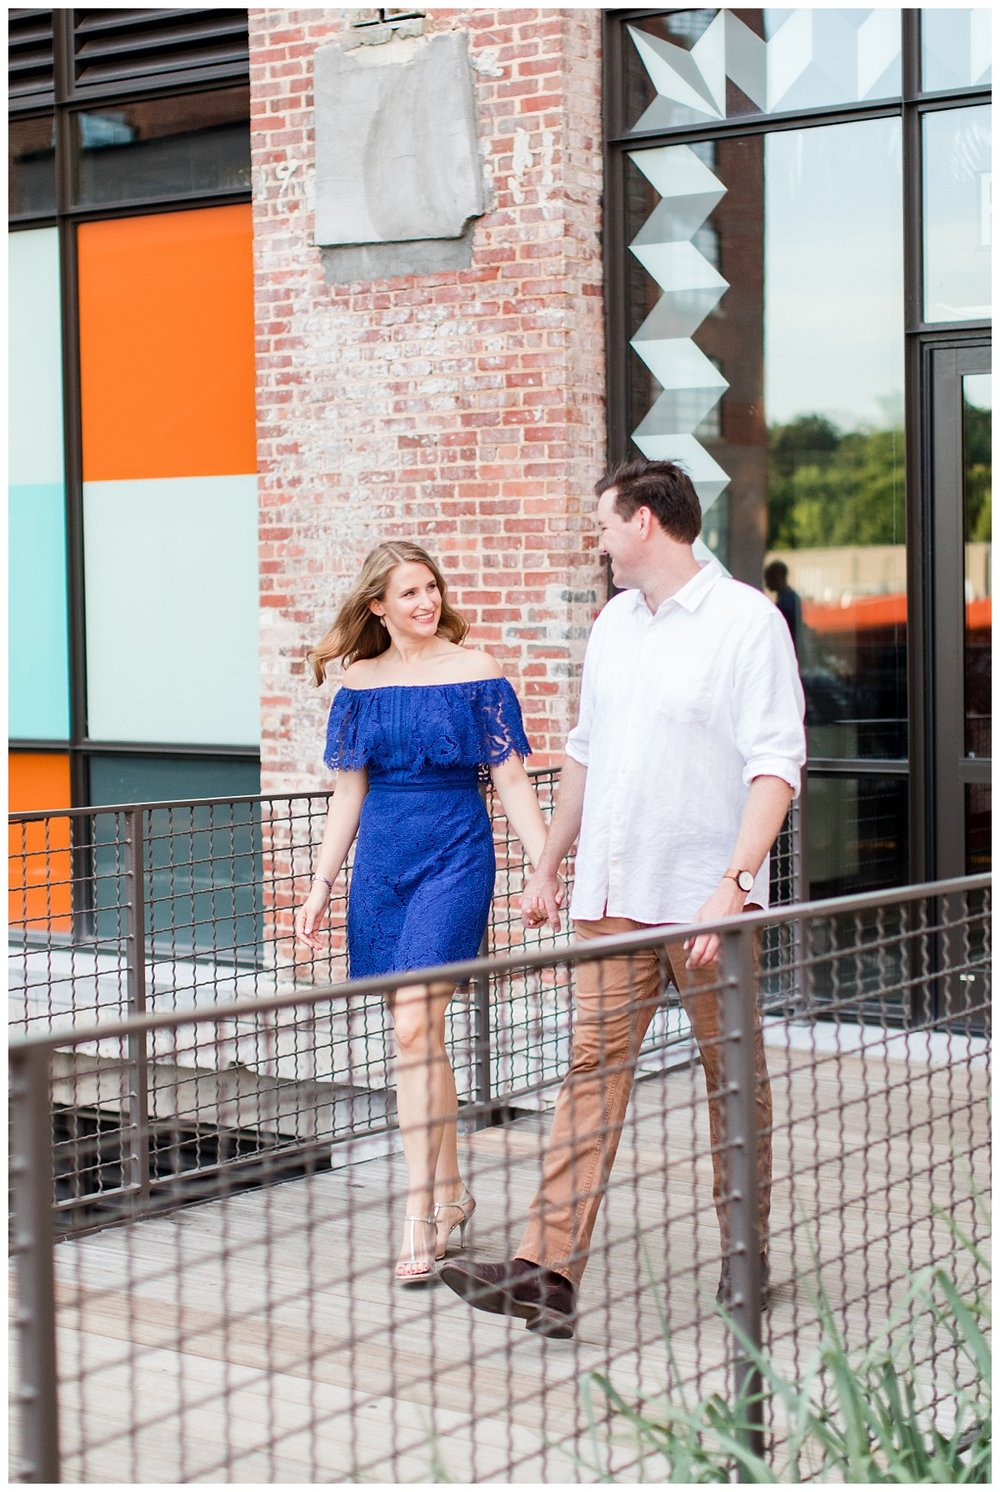 Engagement Pictures_KIm and Hamish_Abby Breaux Photography_Atlanta_Ponce City Market_Jackson Street Bridge_0043.jpg